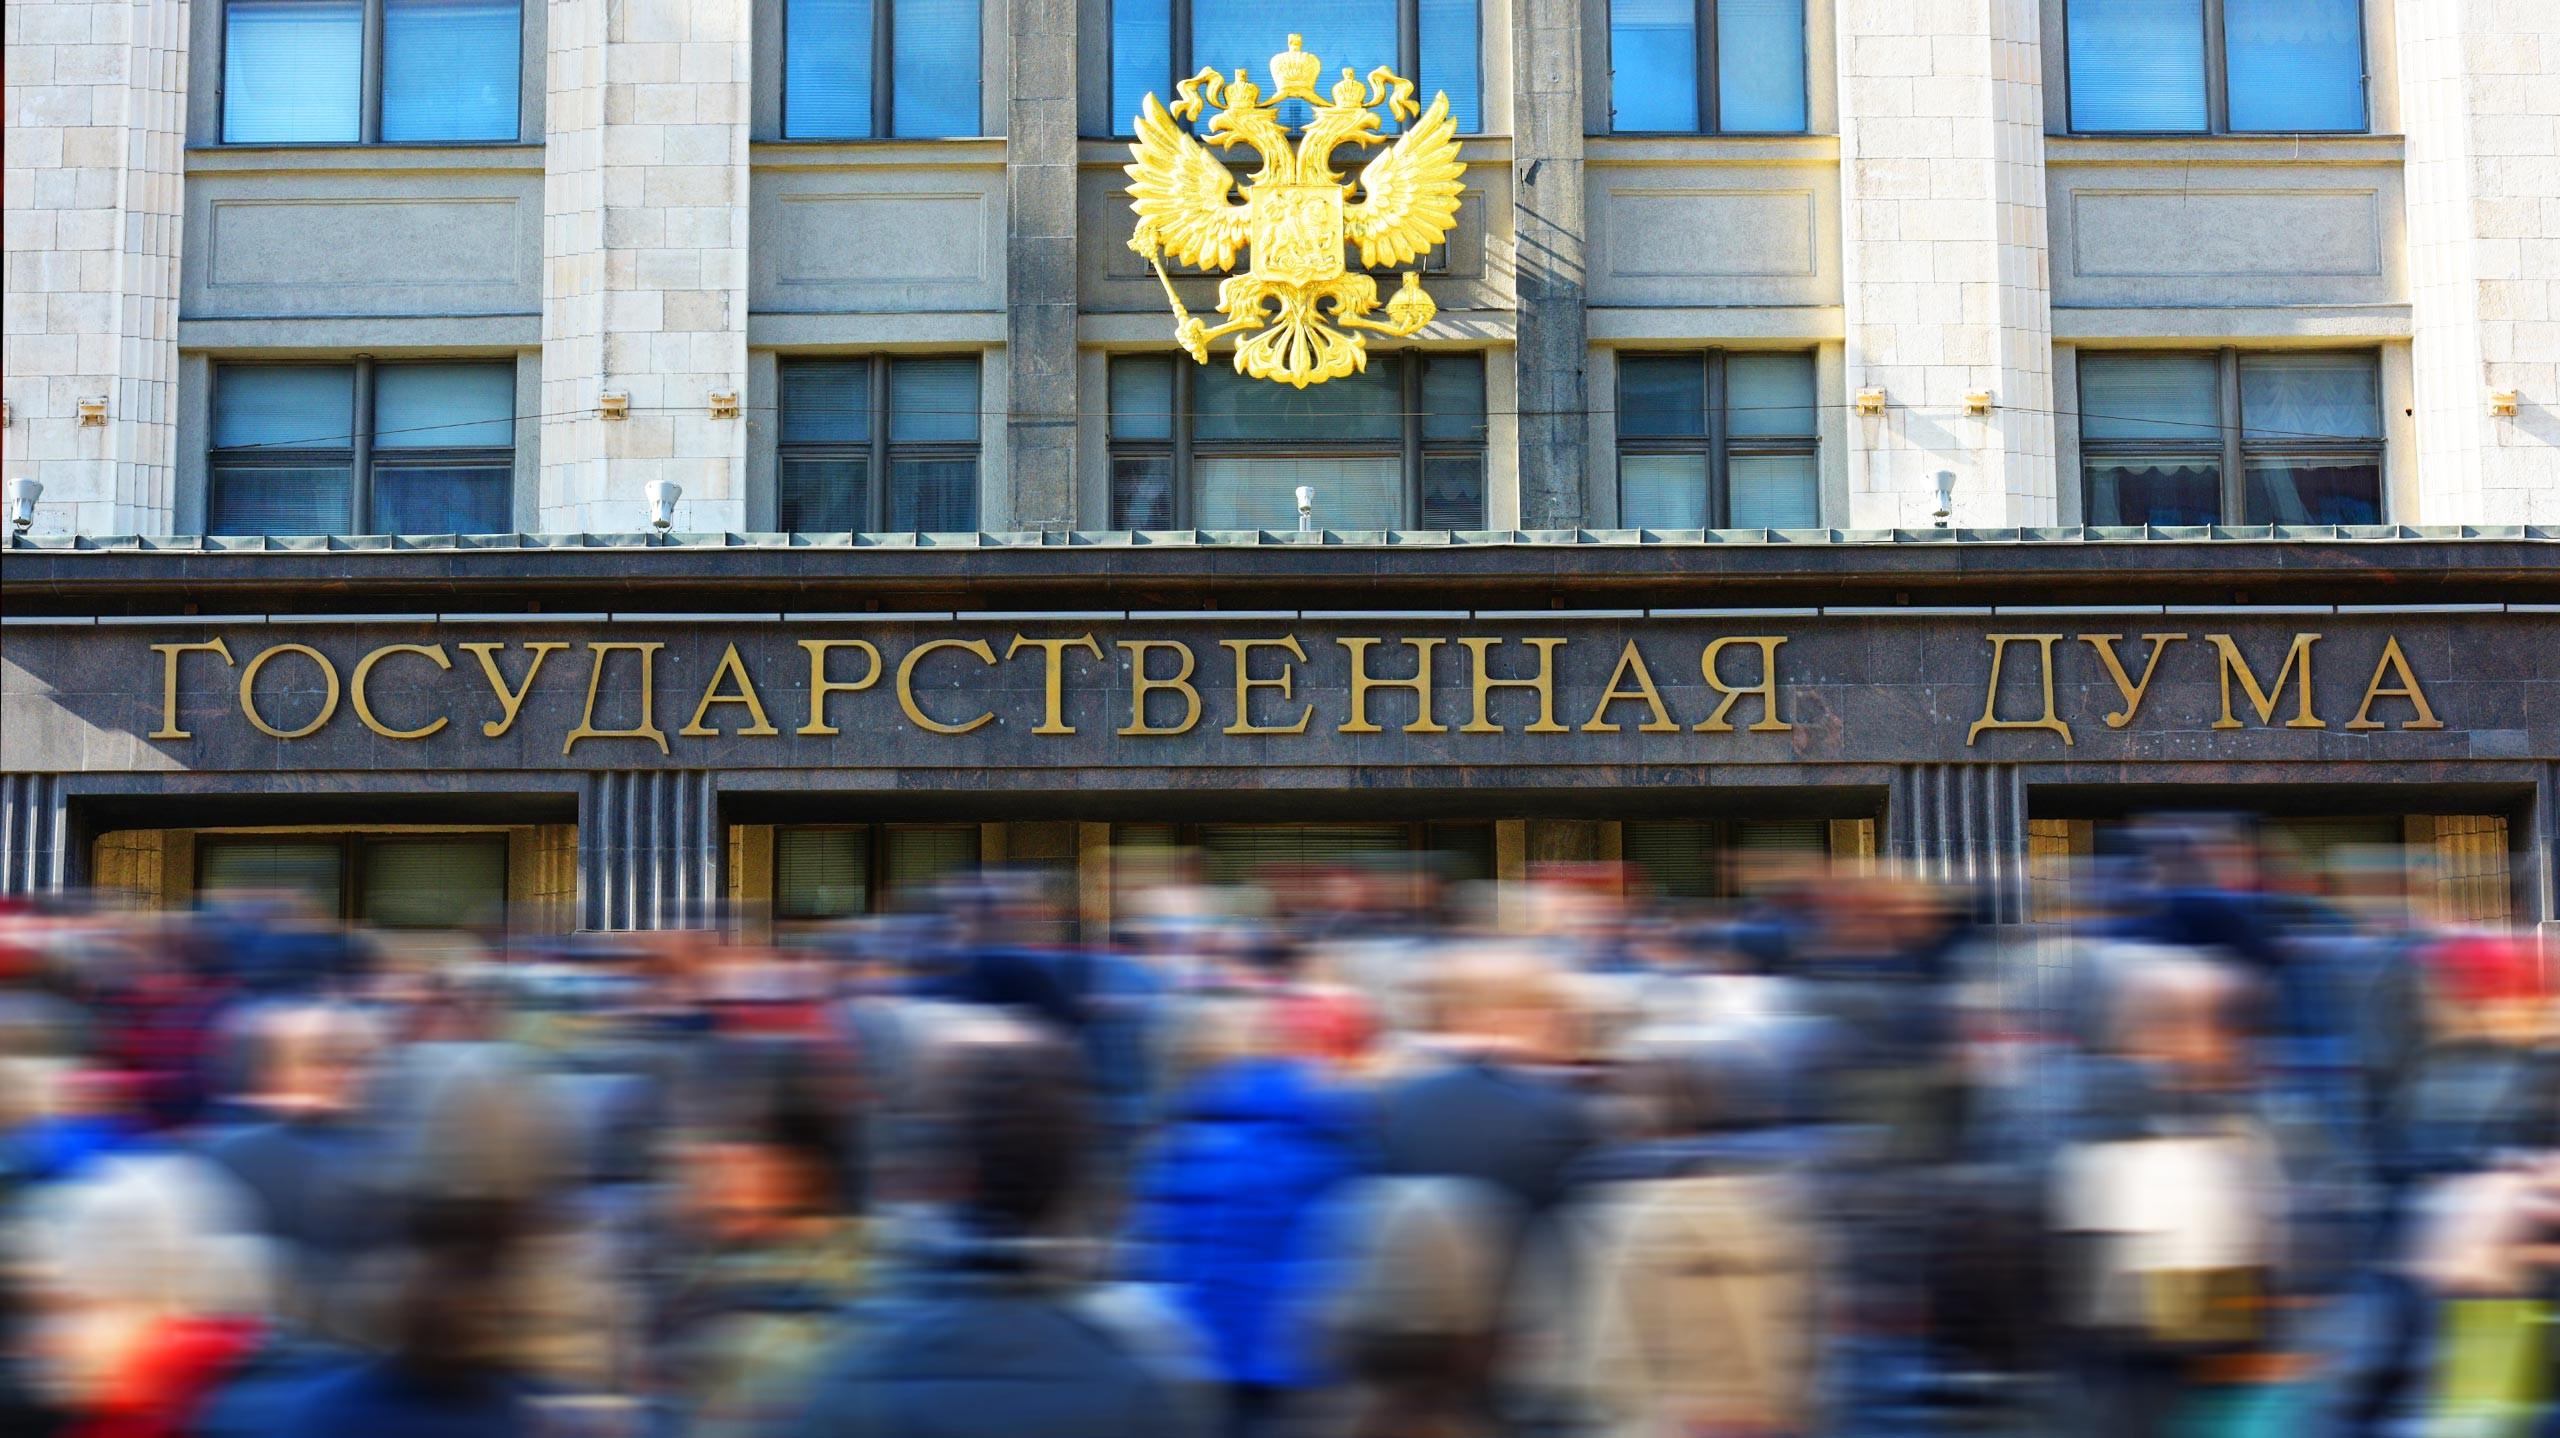 "<p>Коллаж: &copy; L!FE.Фото: &copy; РИА Новости/Наталья Селиверстова&nbsp;&copy;<a href=""https://www.flickr.com/photos/worldcantwait/6940260973/"" target=""_blank"">&nbsp;flickr.com/Debra Sweet</a></p>"